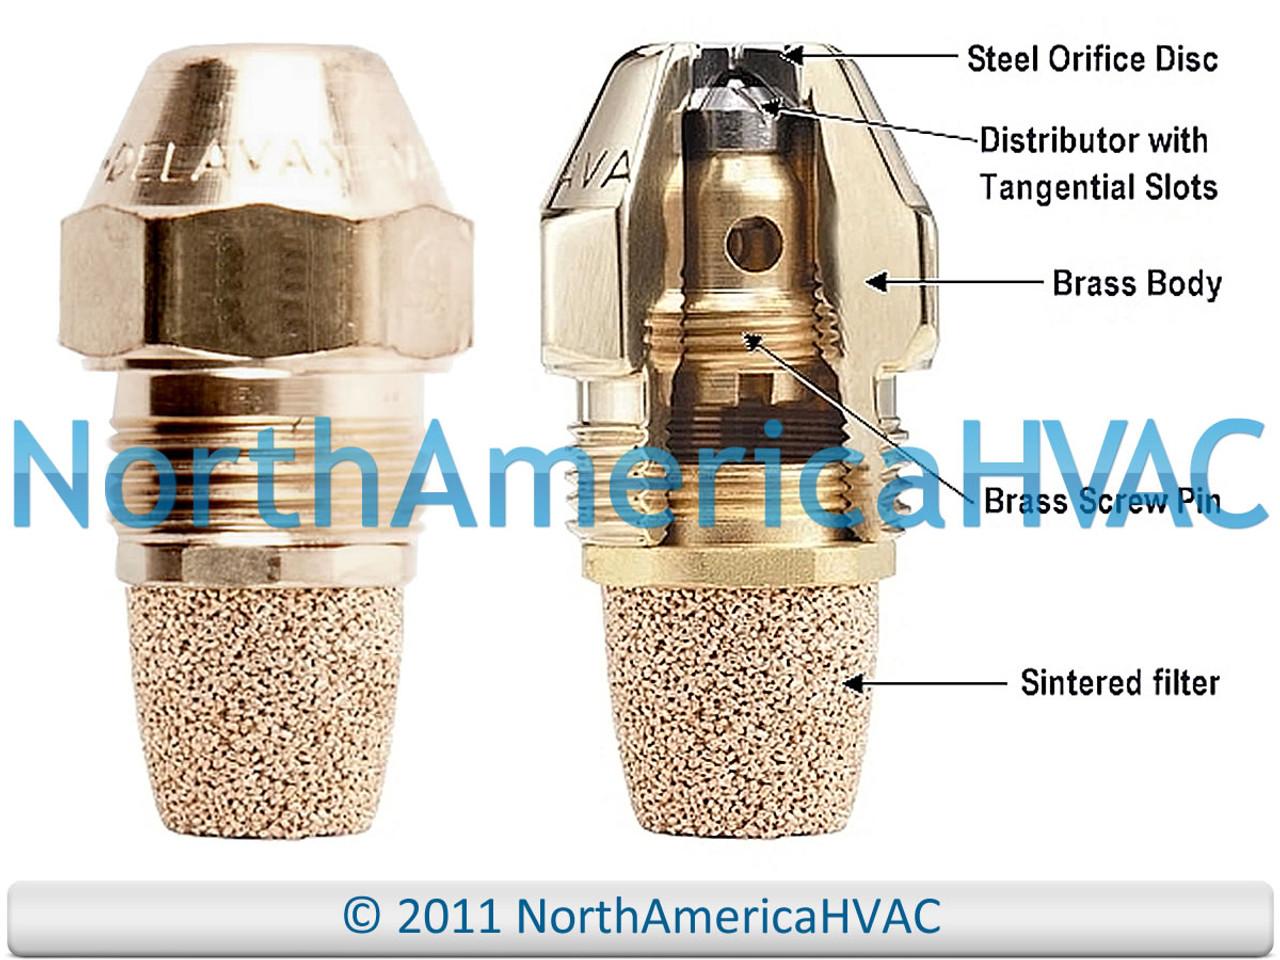 Oil Burner Nozzle Delavan 0.85 GPH 80 Degrees Hollow Cone A H AH NS PL USA